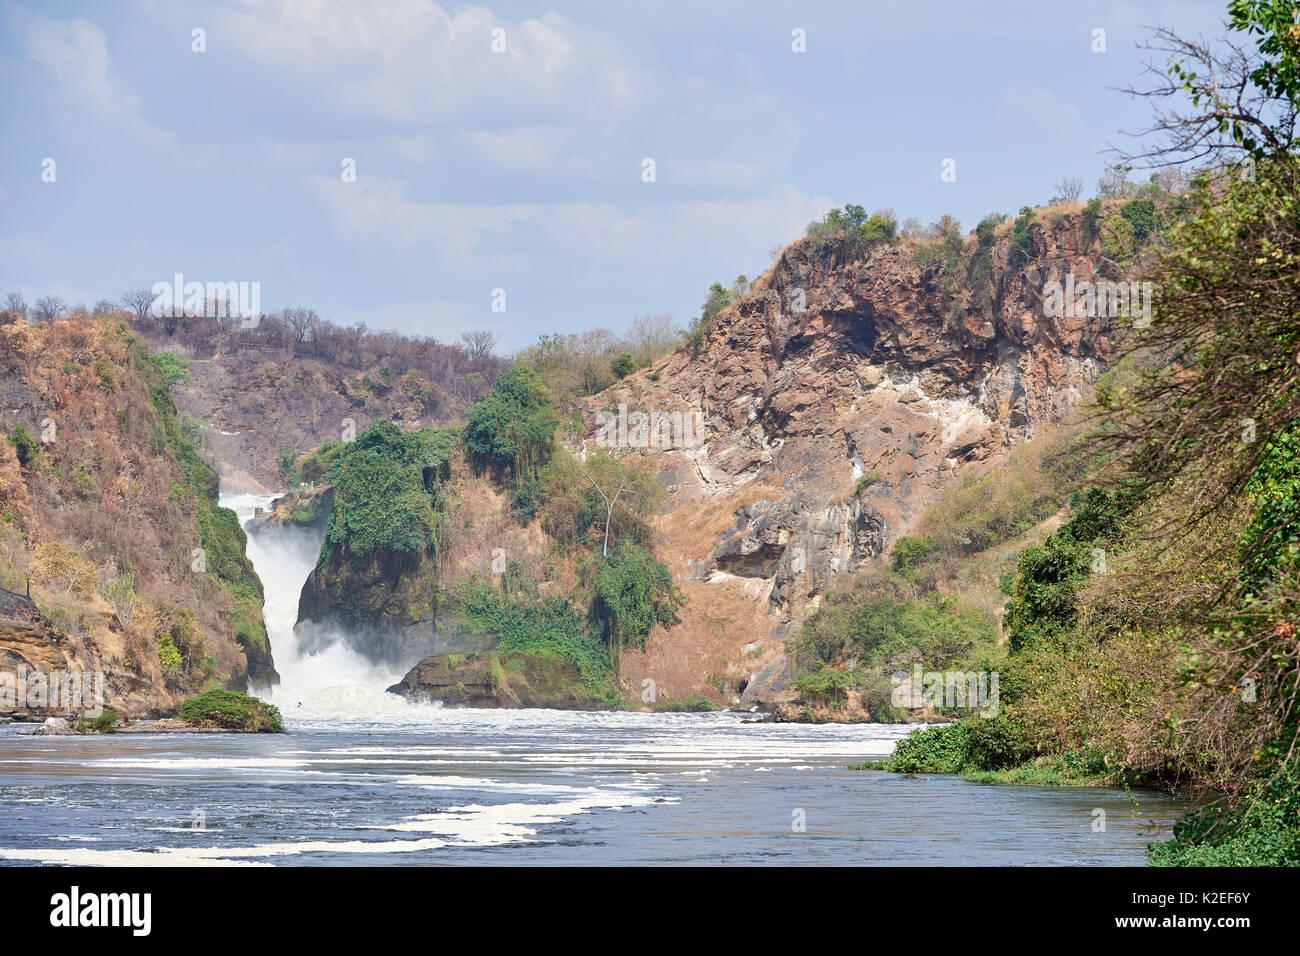 Murchisson Falls National Park and lake Albert, Uganda - Stock Image